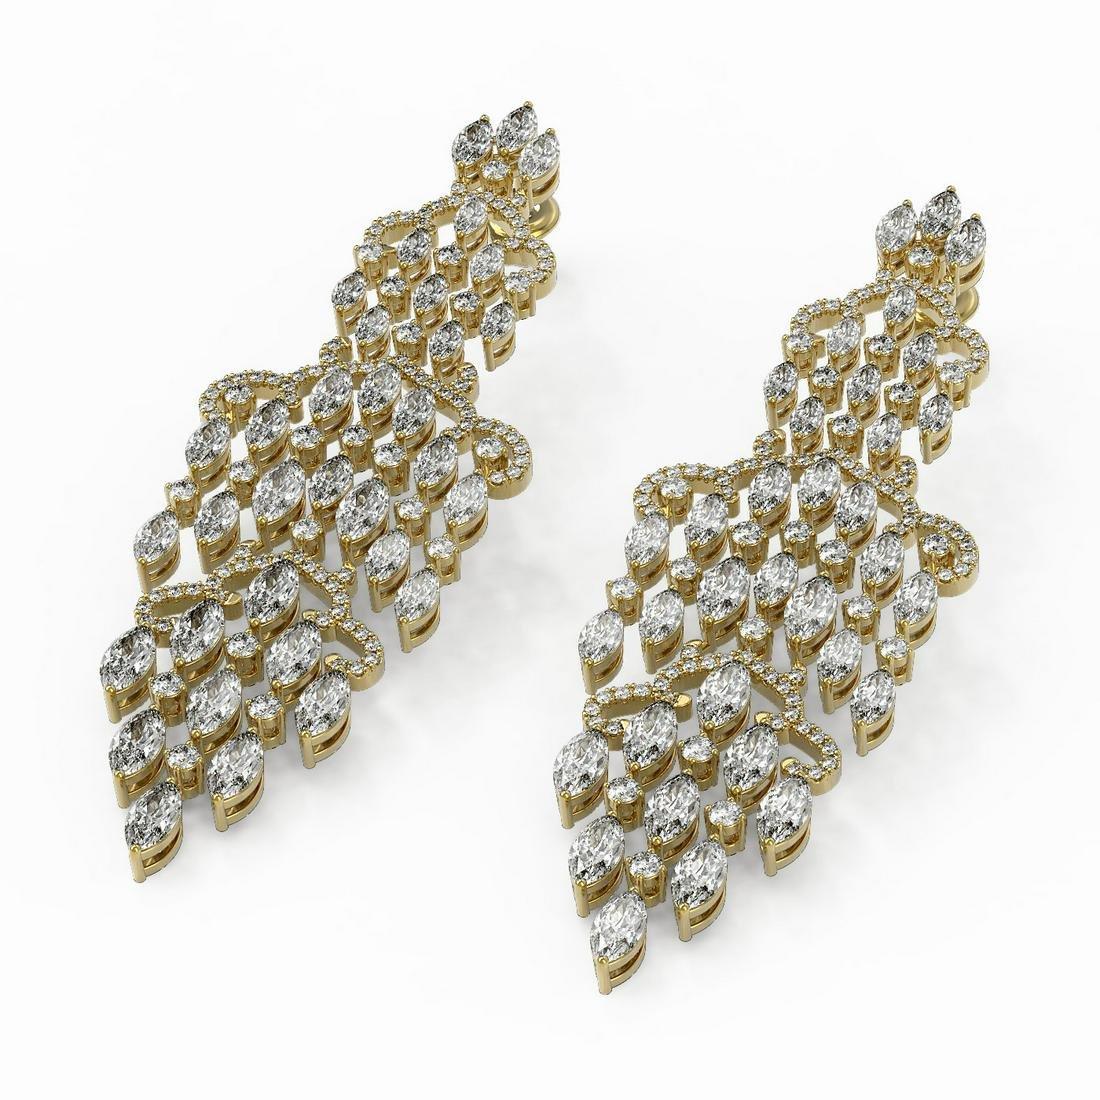 15.32 ctw Marquise Cut Diamond Earrings 18K Yellow Gold